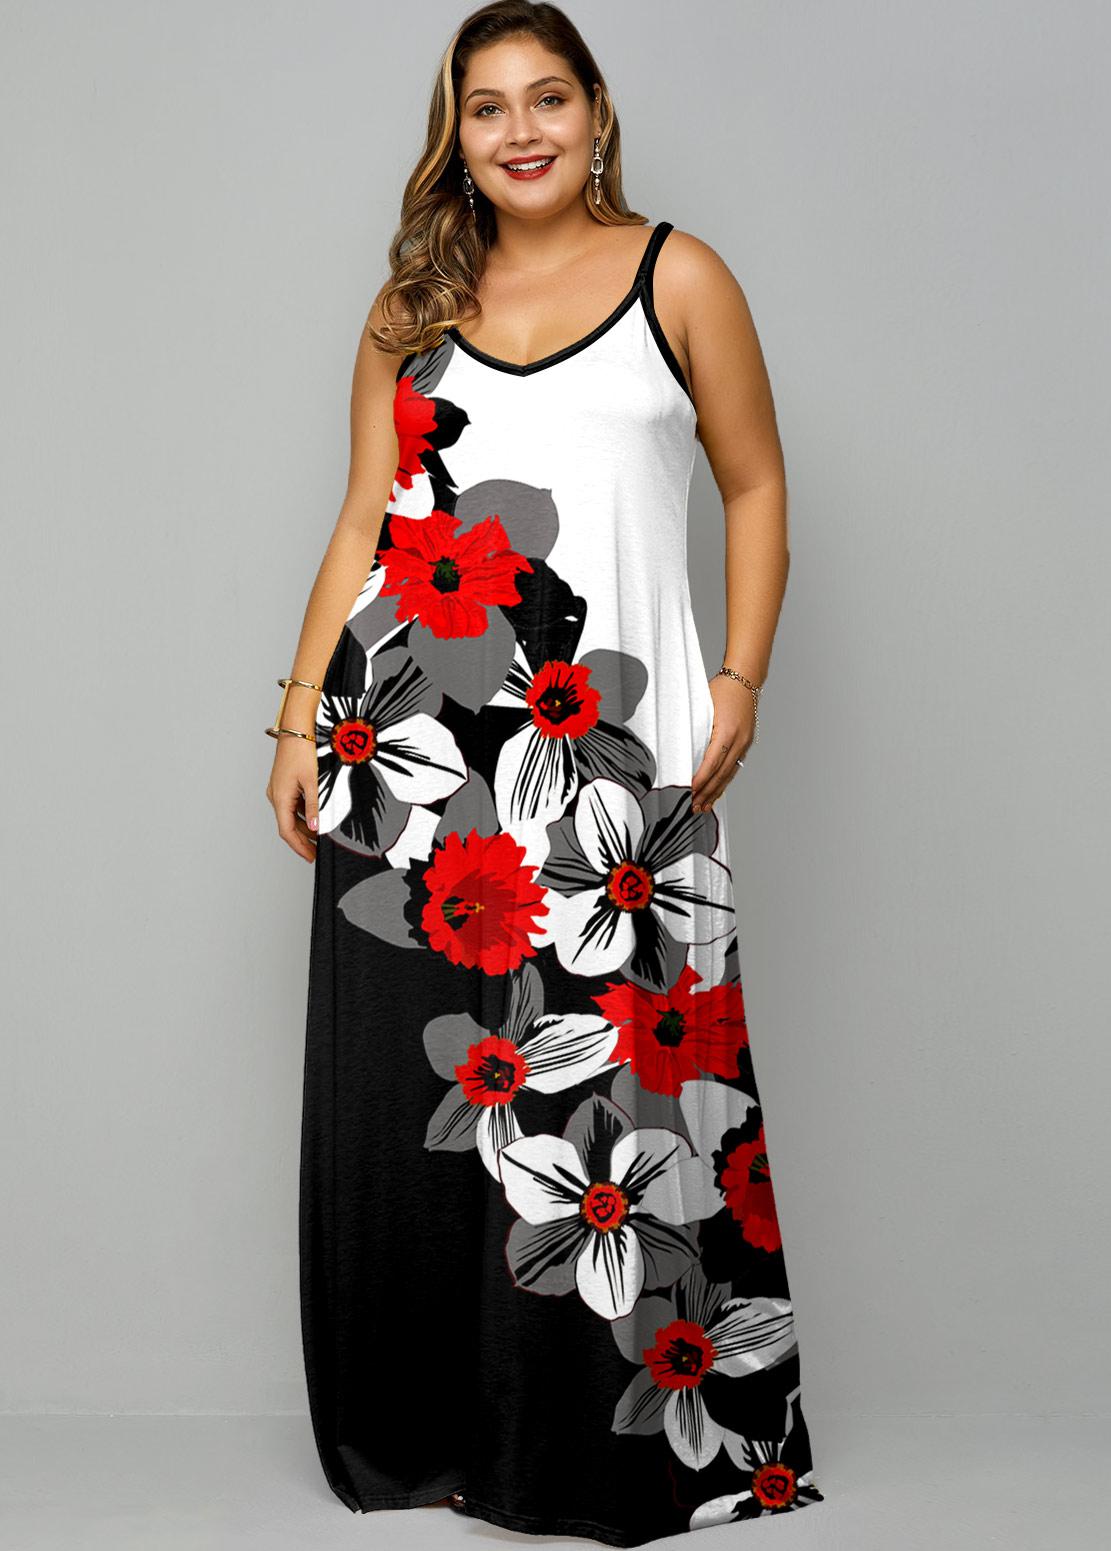 Floral Print Spaghetti Strap Plus Size Maxi Dress